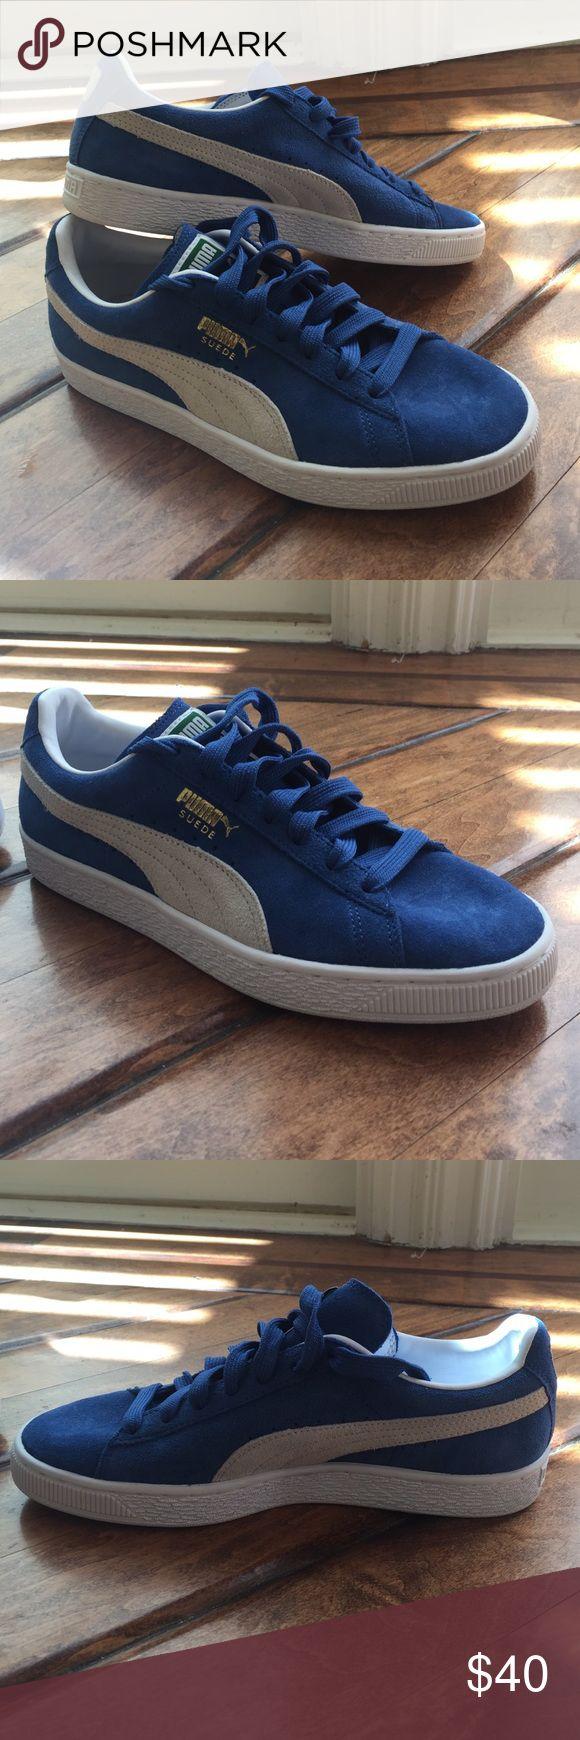 Puma suede shoes blue puma suede shoes NEVER WORN Puma Shoes Sneakers